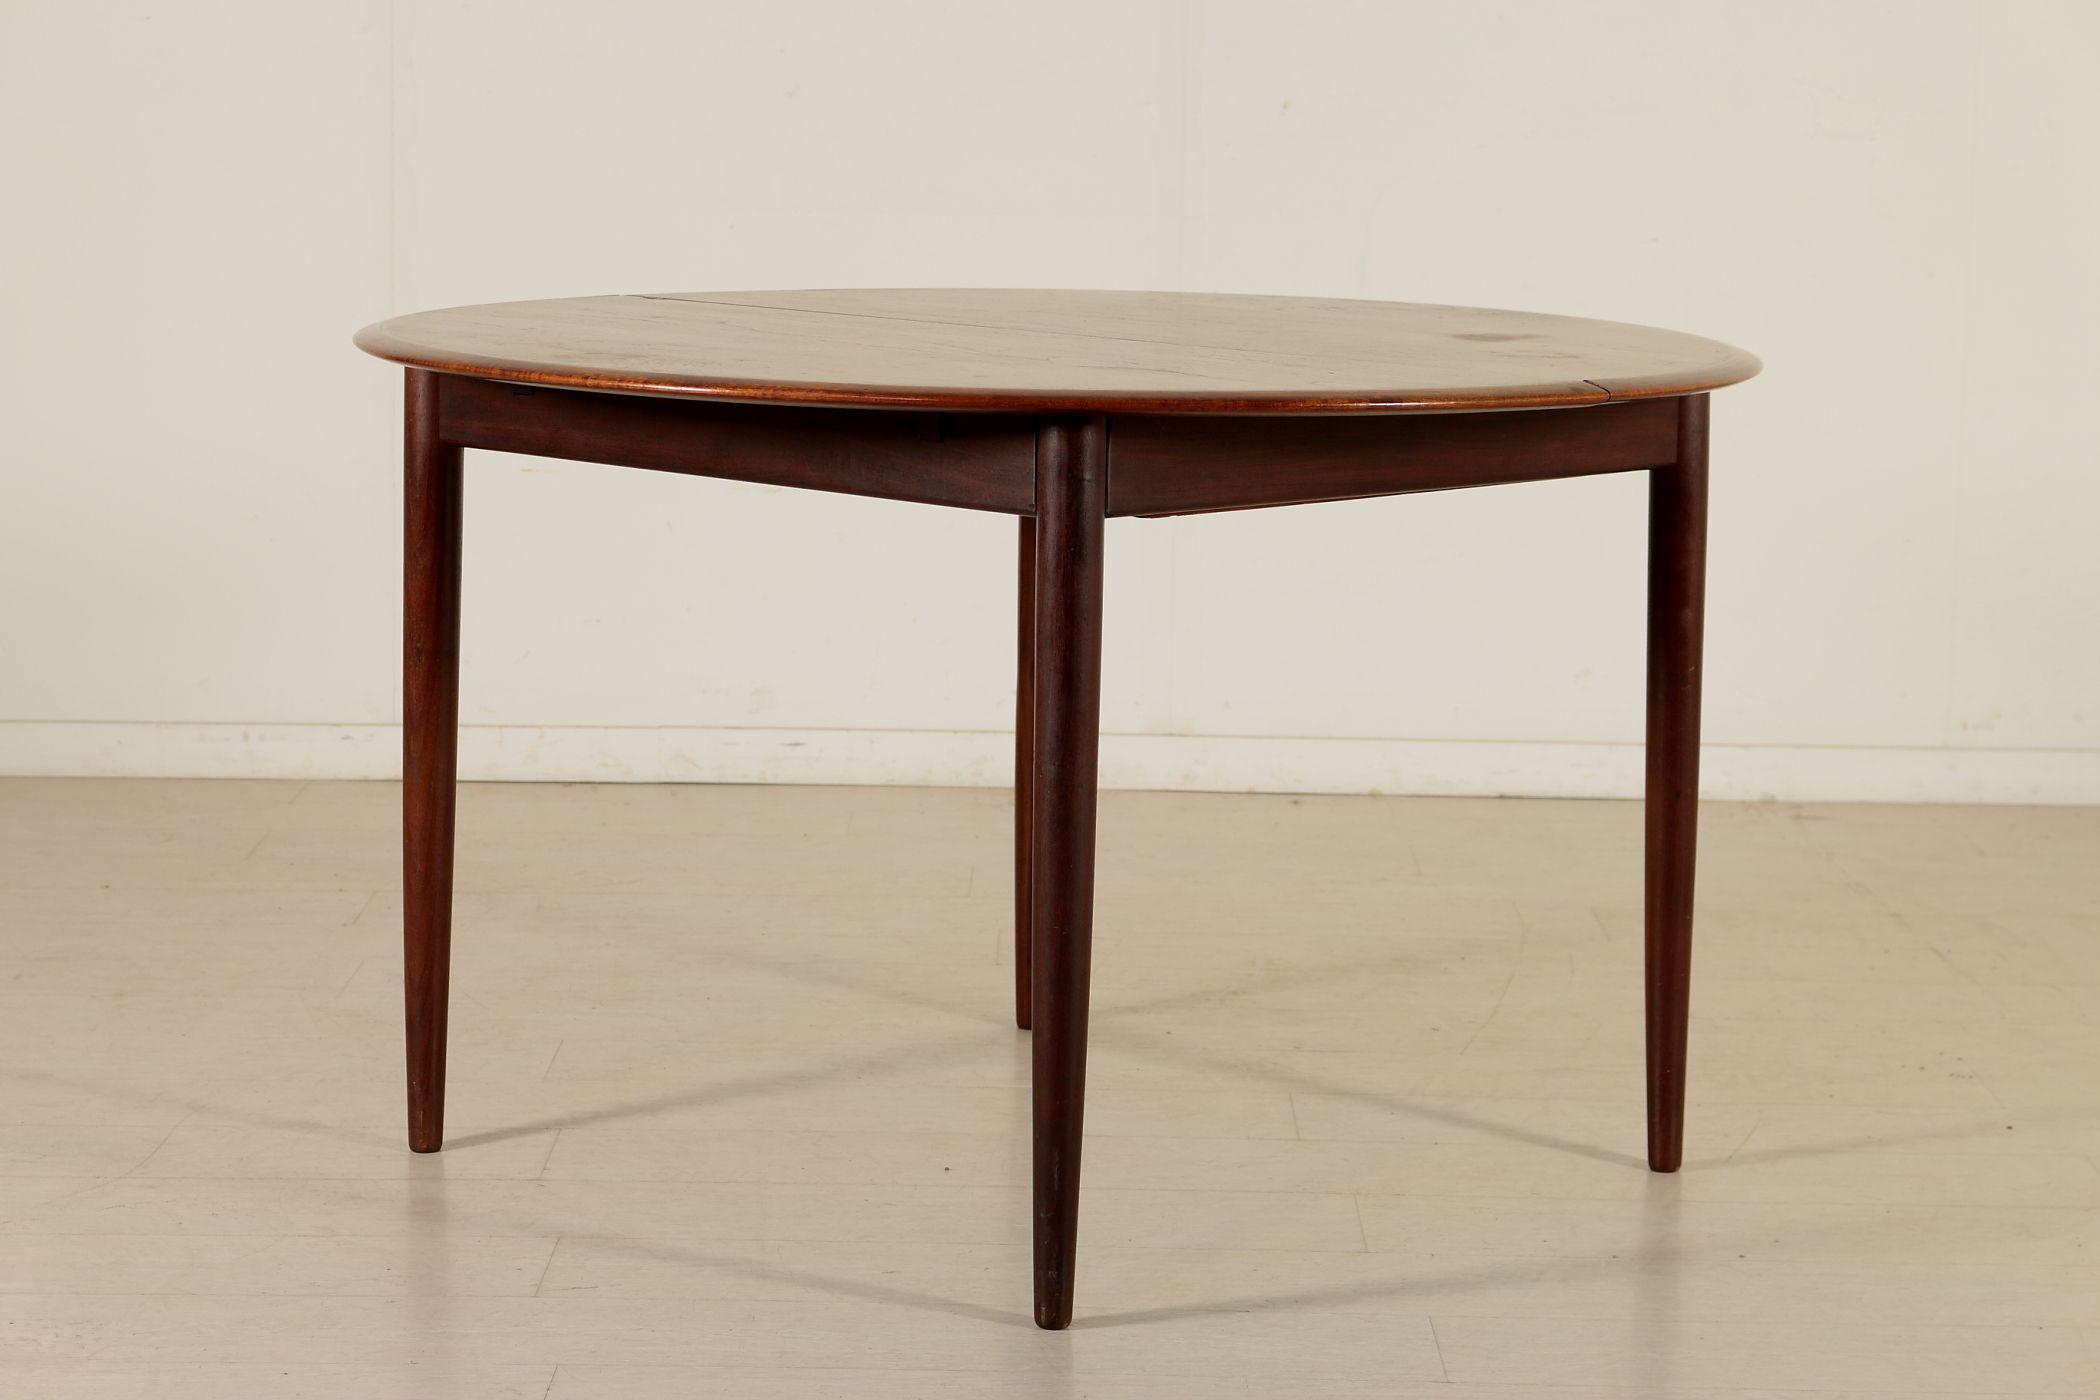 Tavolo anni 50-60 #anticonline #mobilio #arredamento #midcentury ...